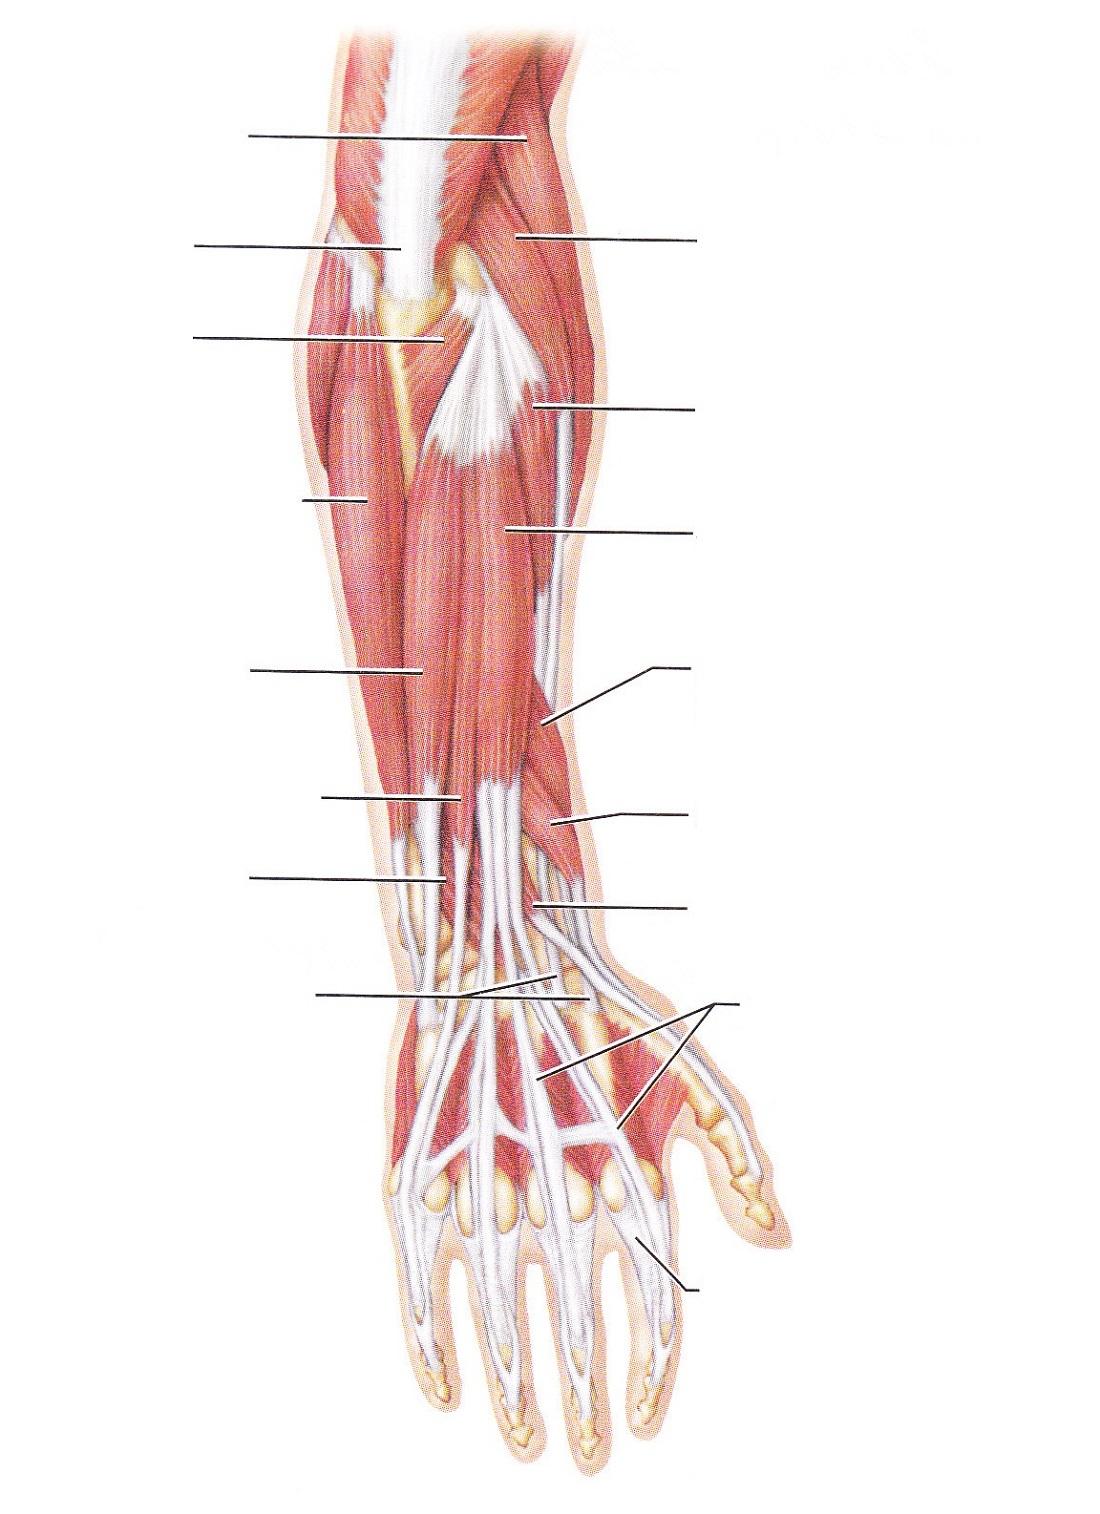 Blank Arm Diagram